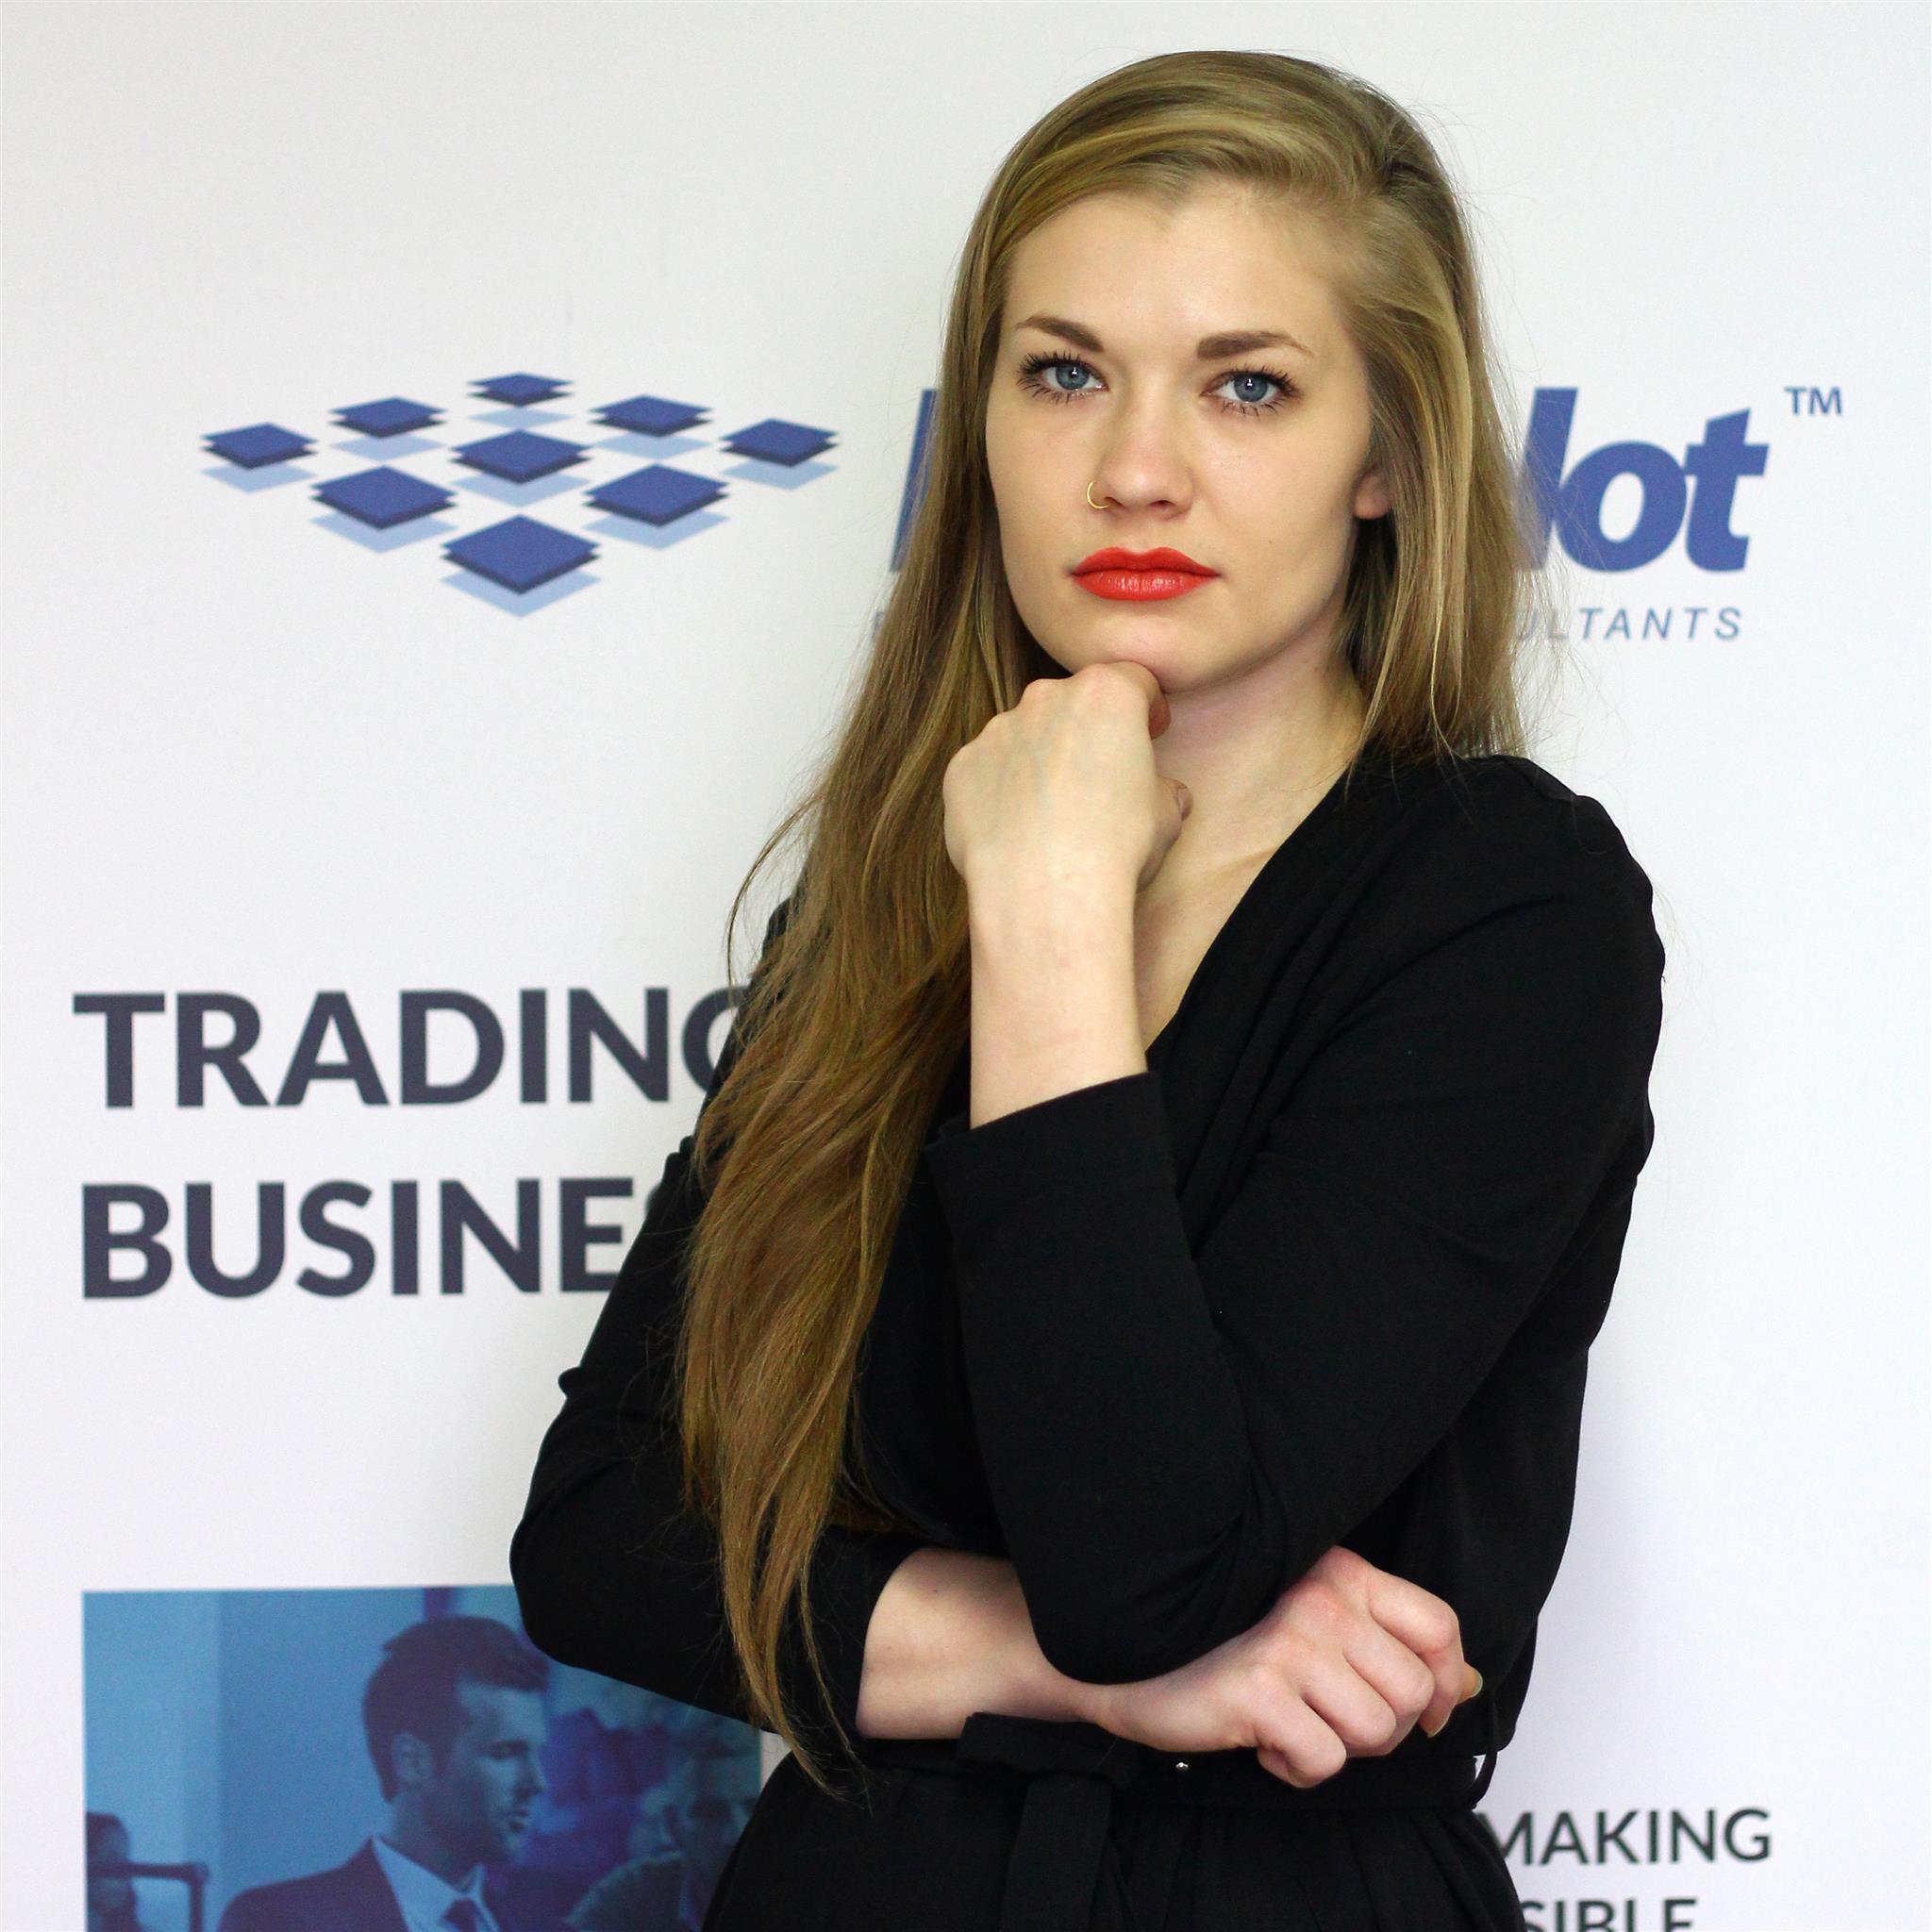 Partner Coordinator Lina Franikowska